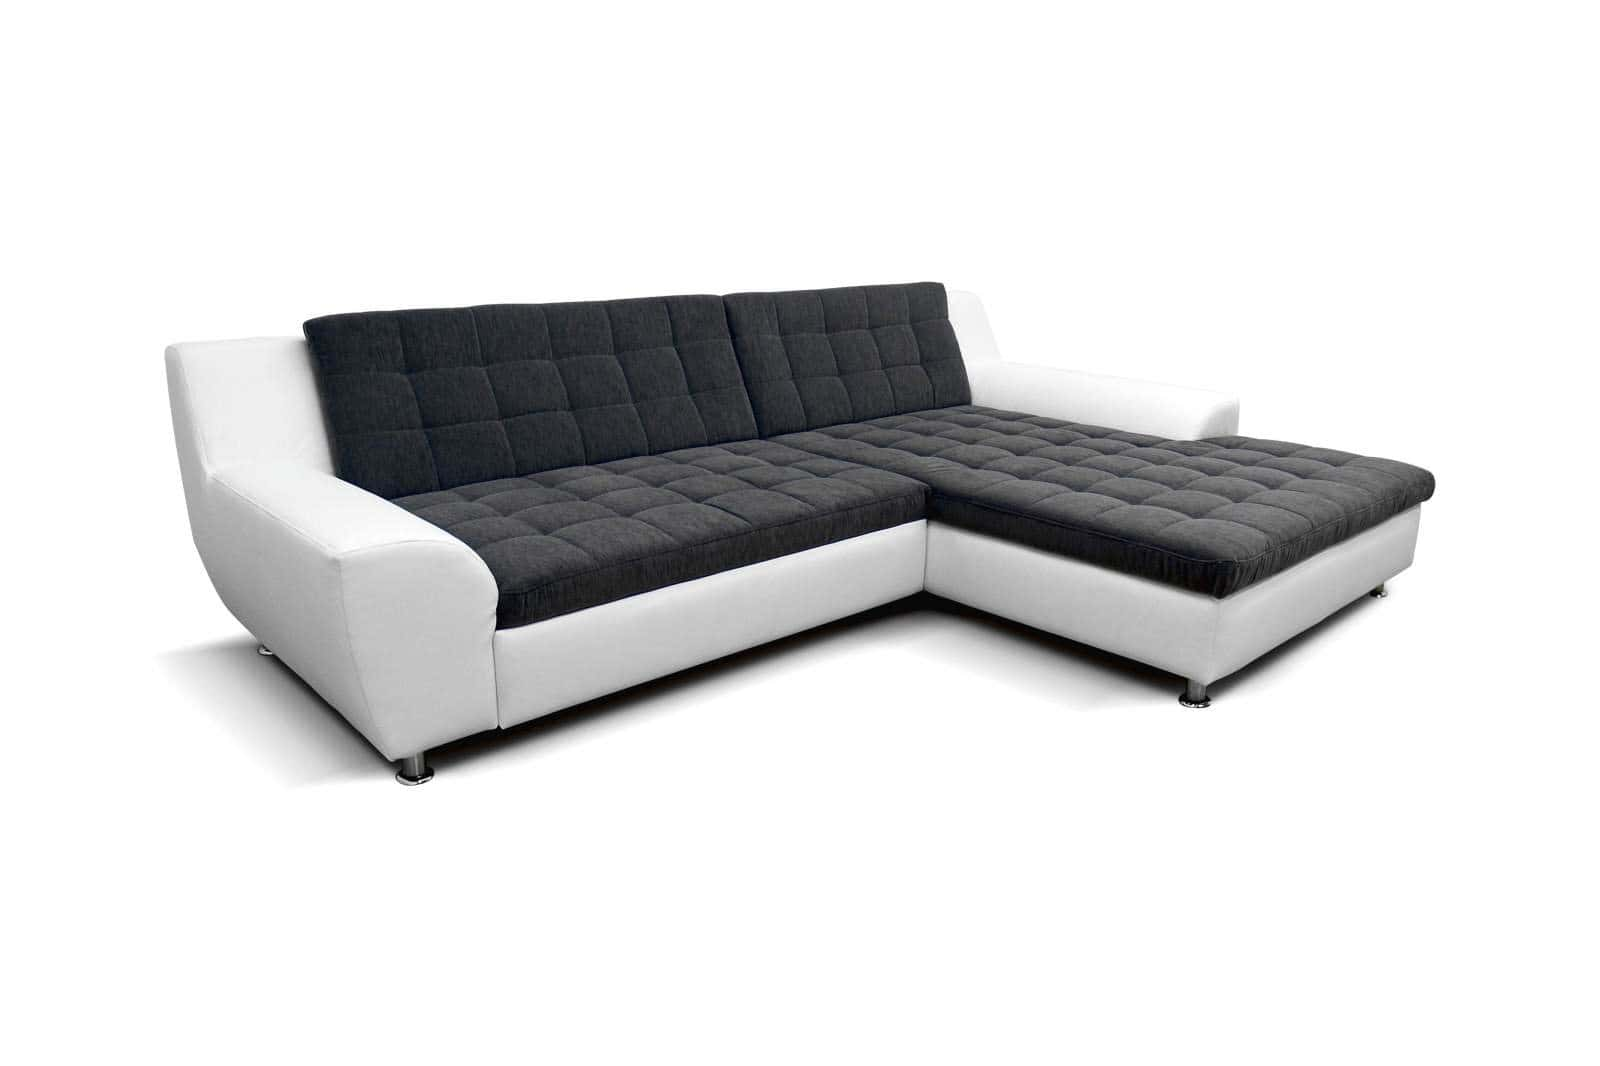 polsterecke morton wei dunkelgrau recamiere rechts. Black Bedroom Furniture Sets. Home Design Ideas